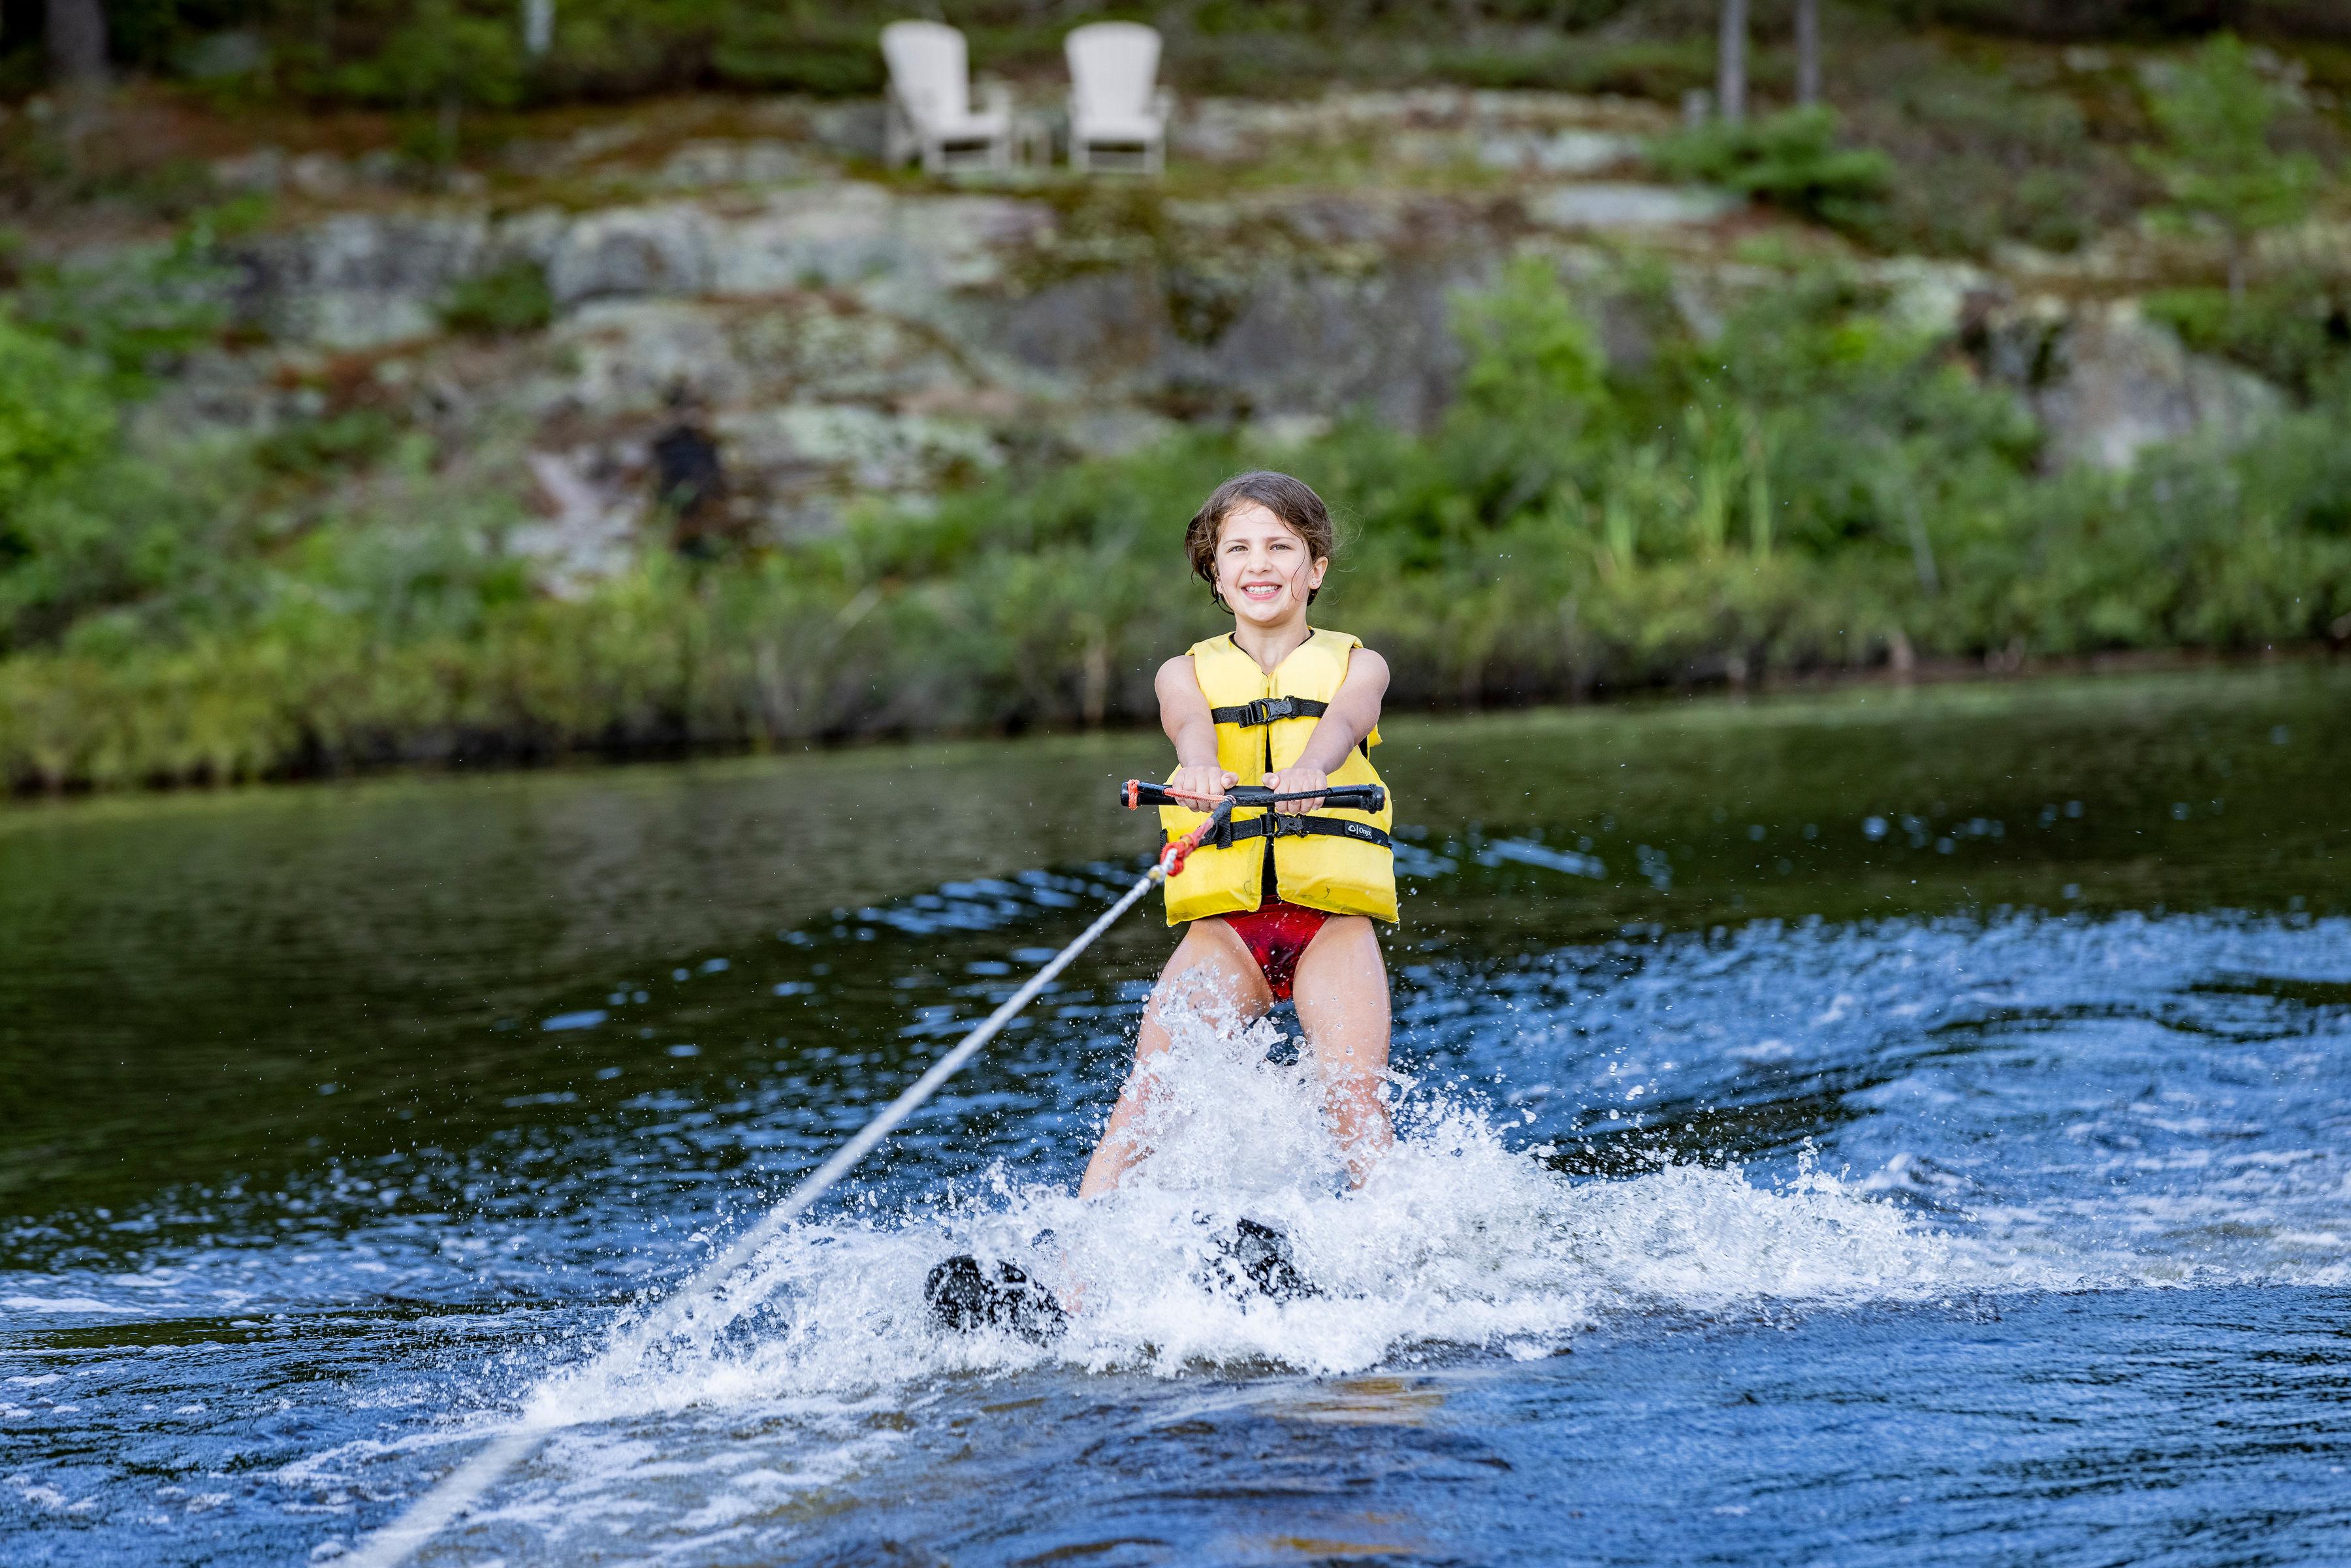 Girl Waterskiing